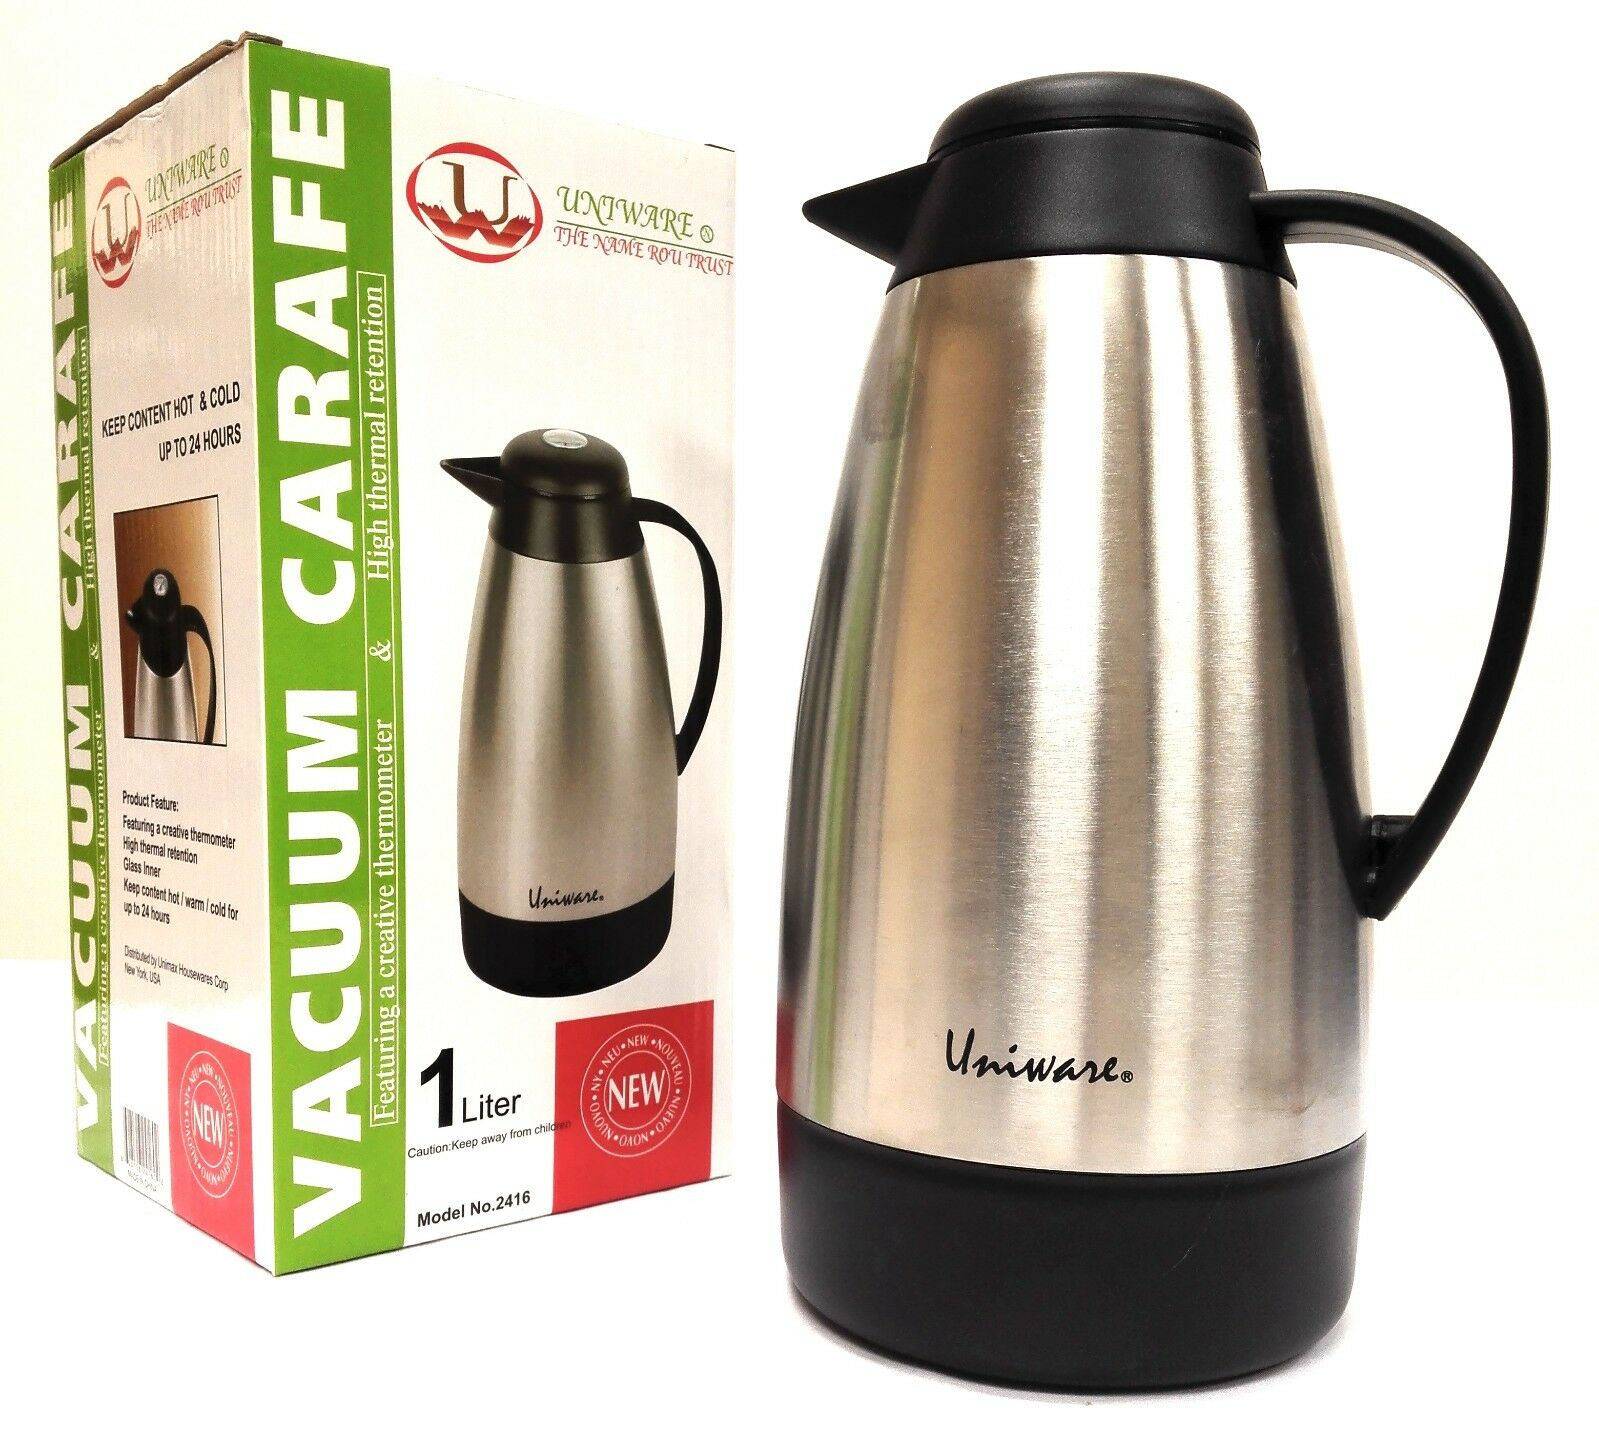 2416 stainless steel coffee tea carafe vacuum